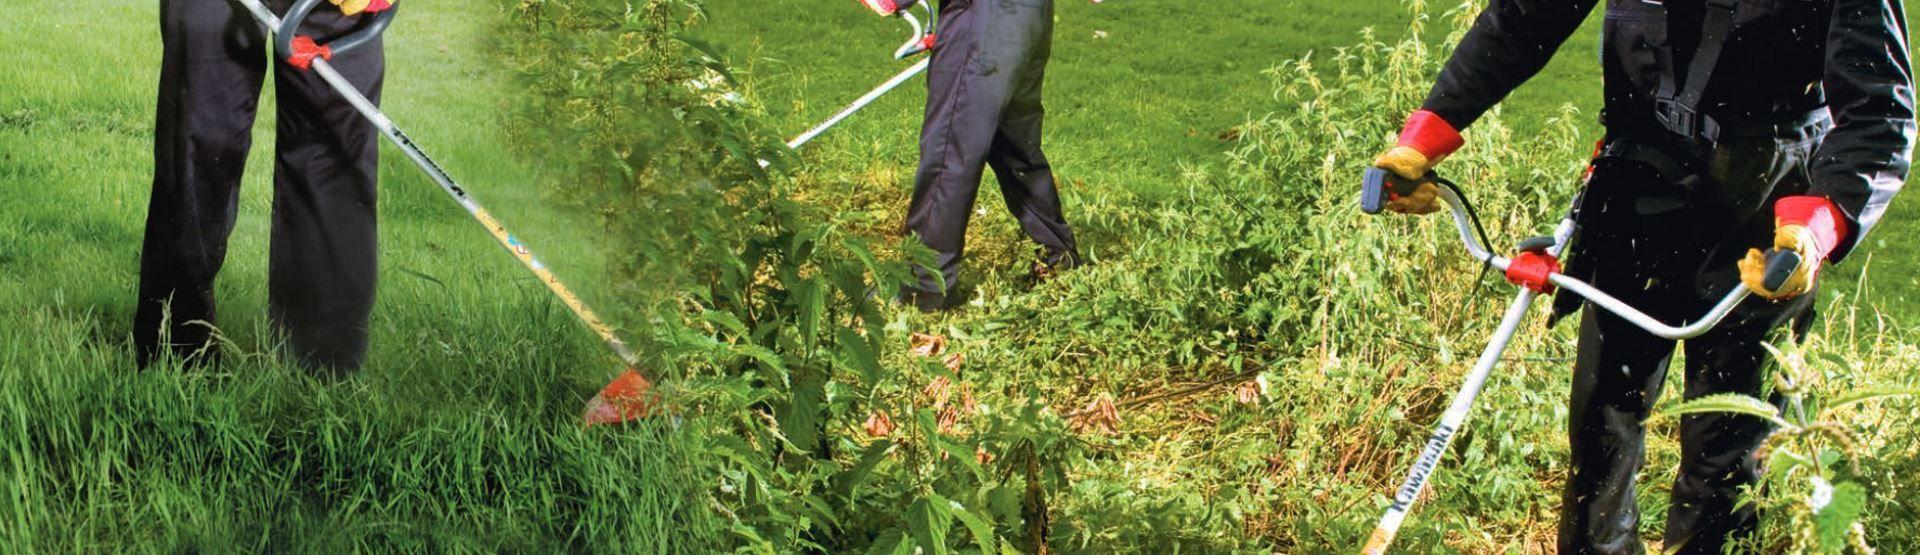 Šišači trave - Flaxerice - Flakserice - Trimeri